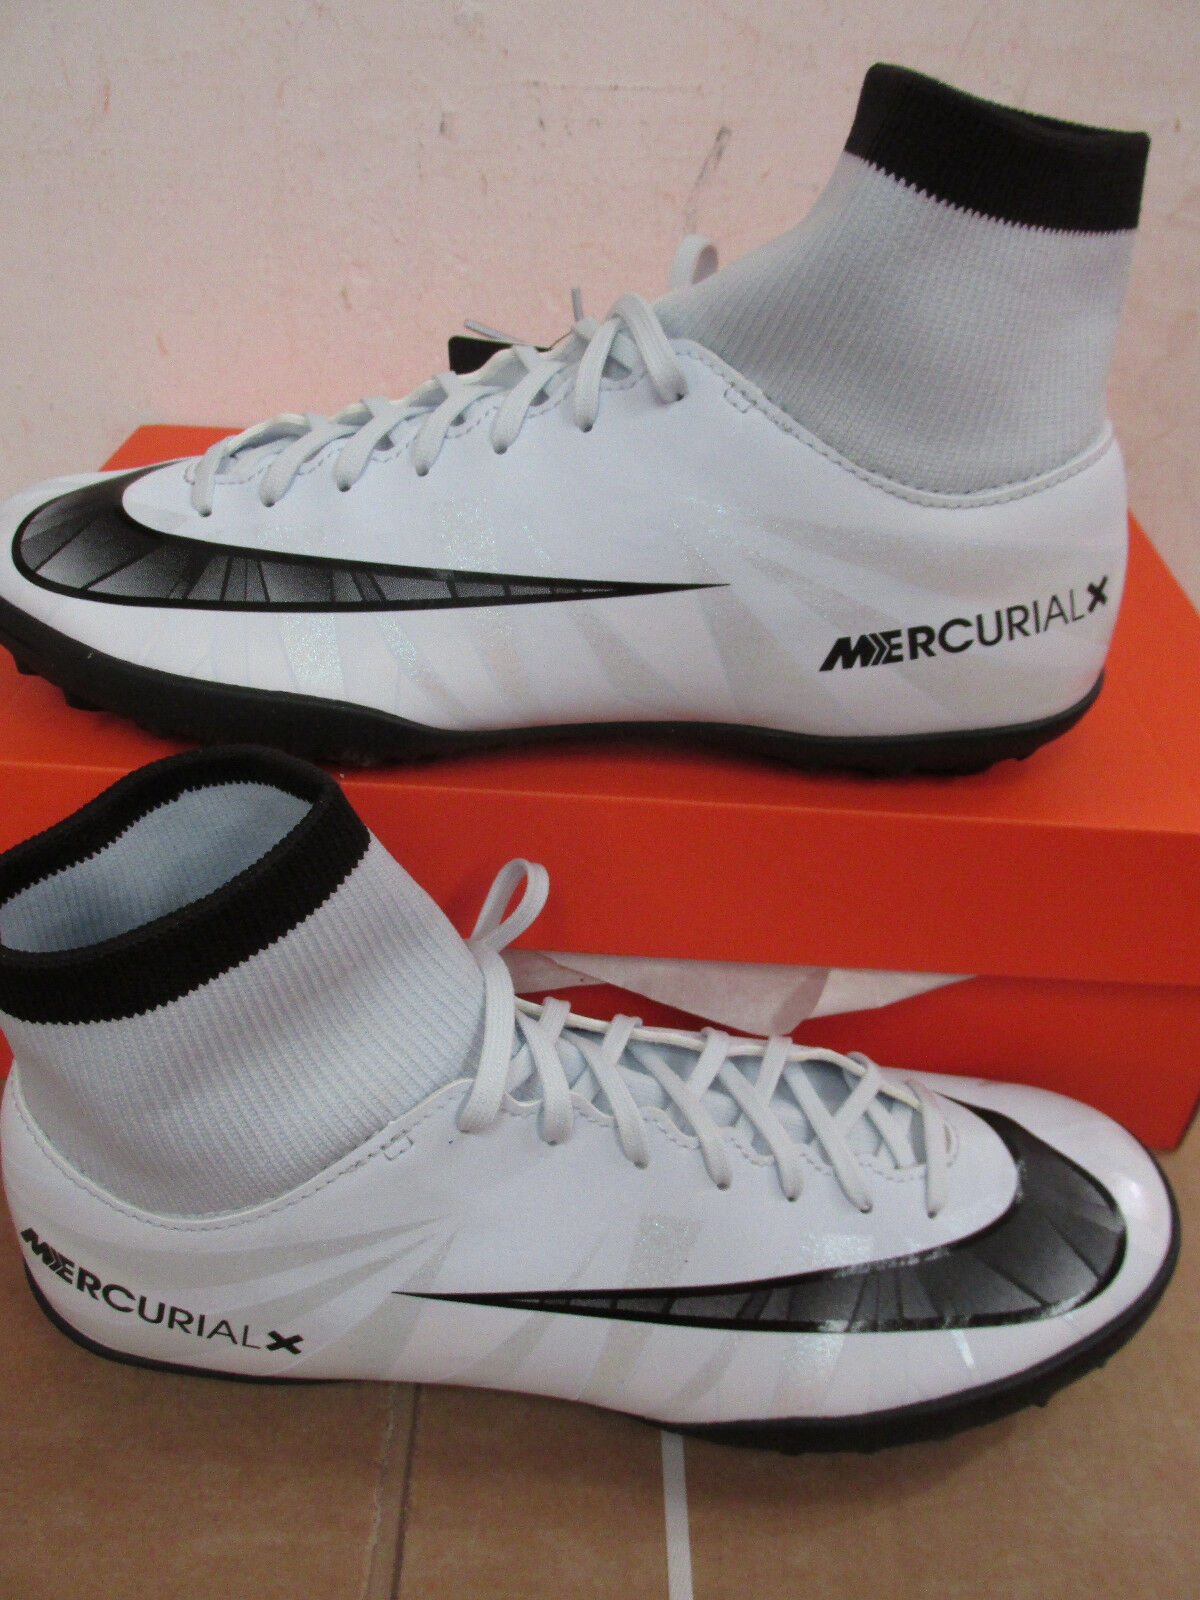 Presunto Engañoso Represalias  nike mercurialx victory VI CR7 DF TF mens football boots 903612 401  CLEARANCE for sale online